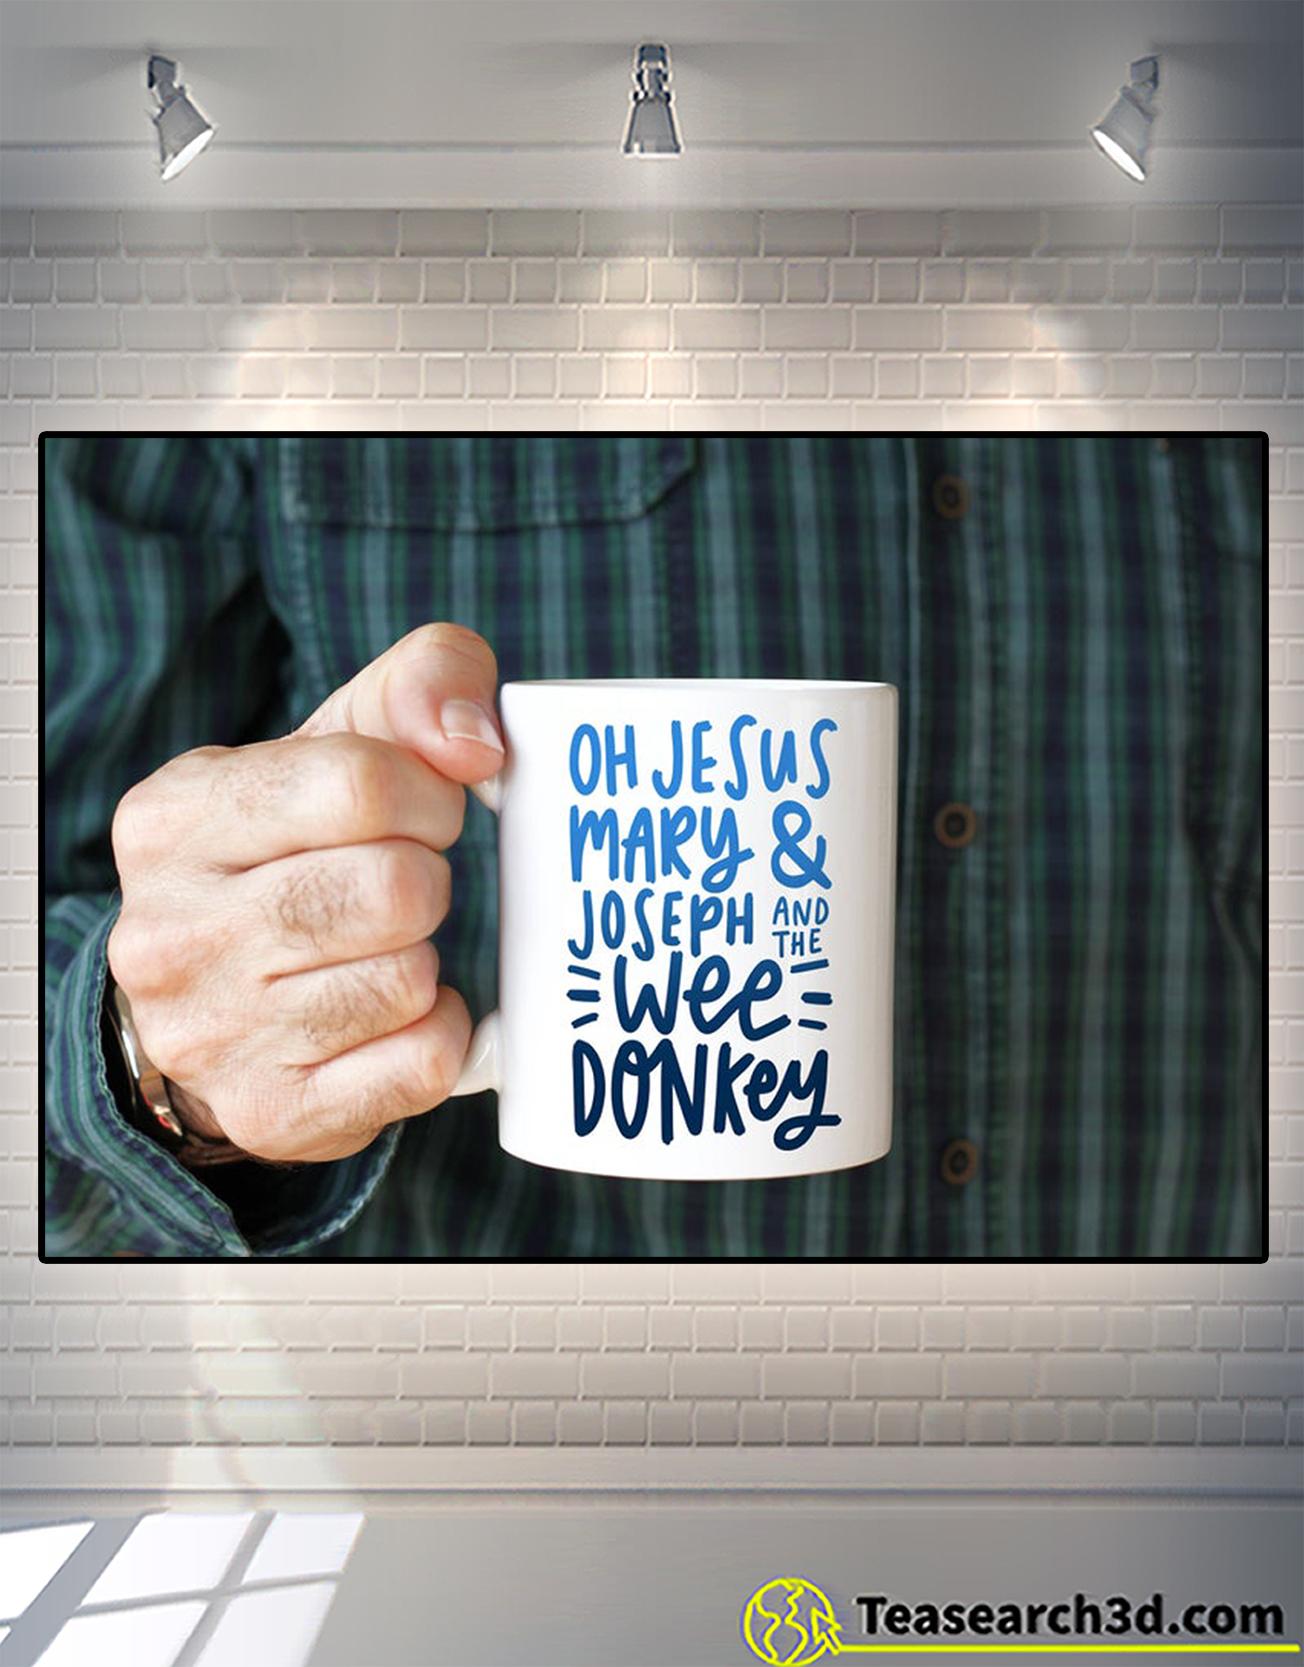 Oh jesus mary and joseph and the wee donkey mug 1